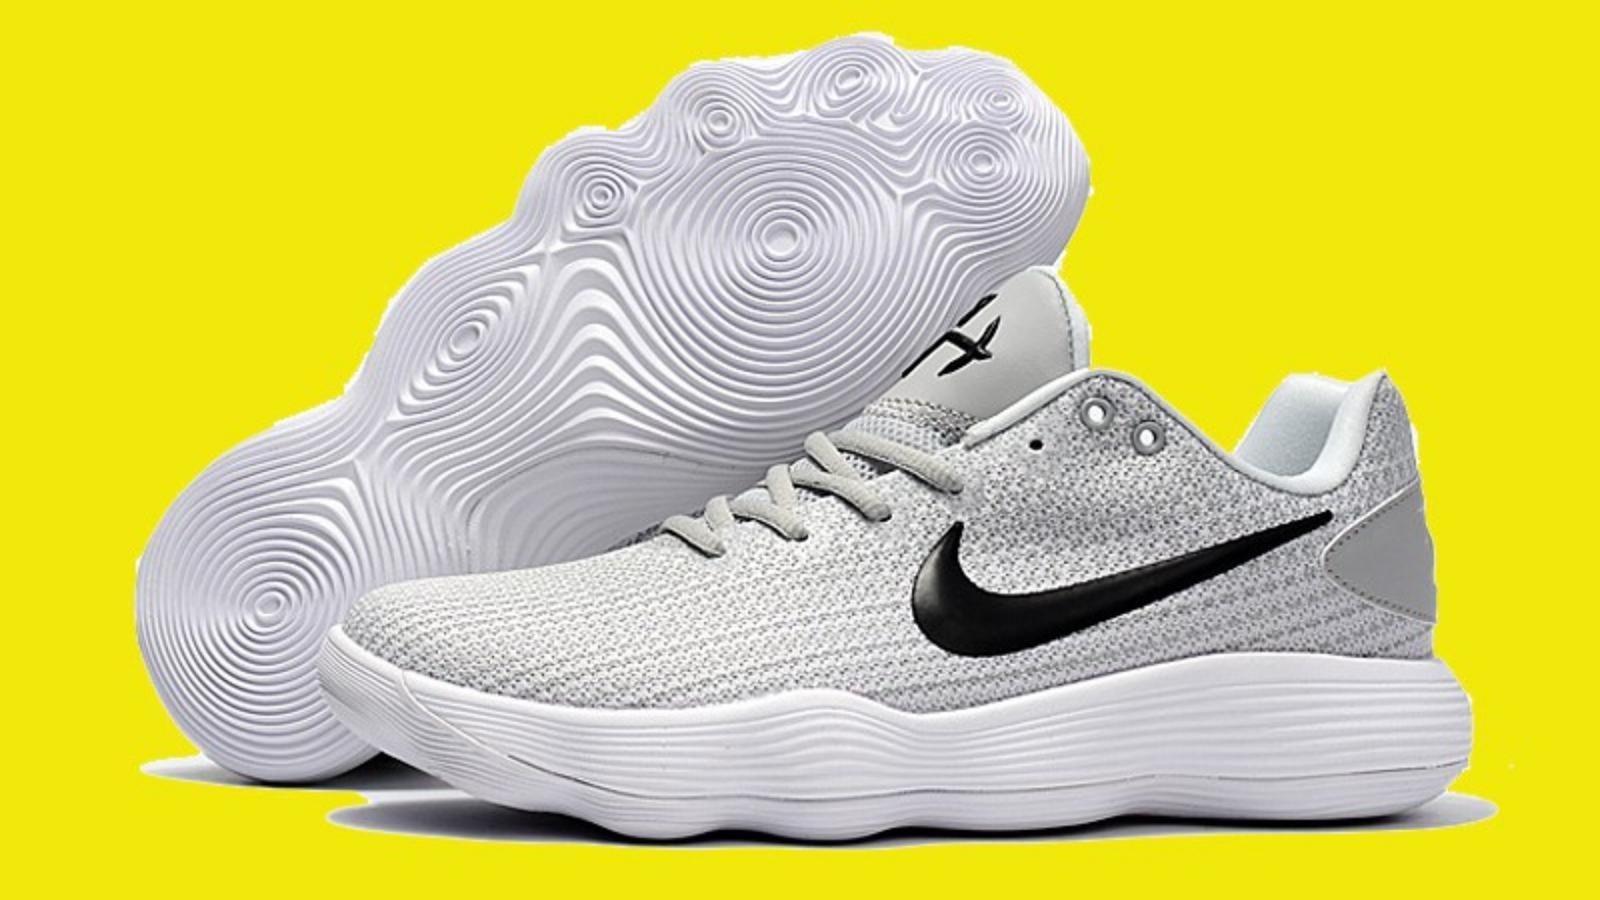 size hyperdunk 2017 low basketball shoes grey